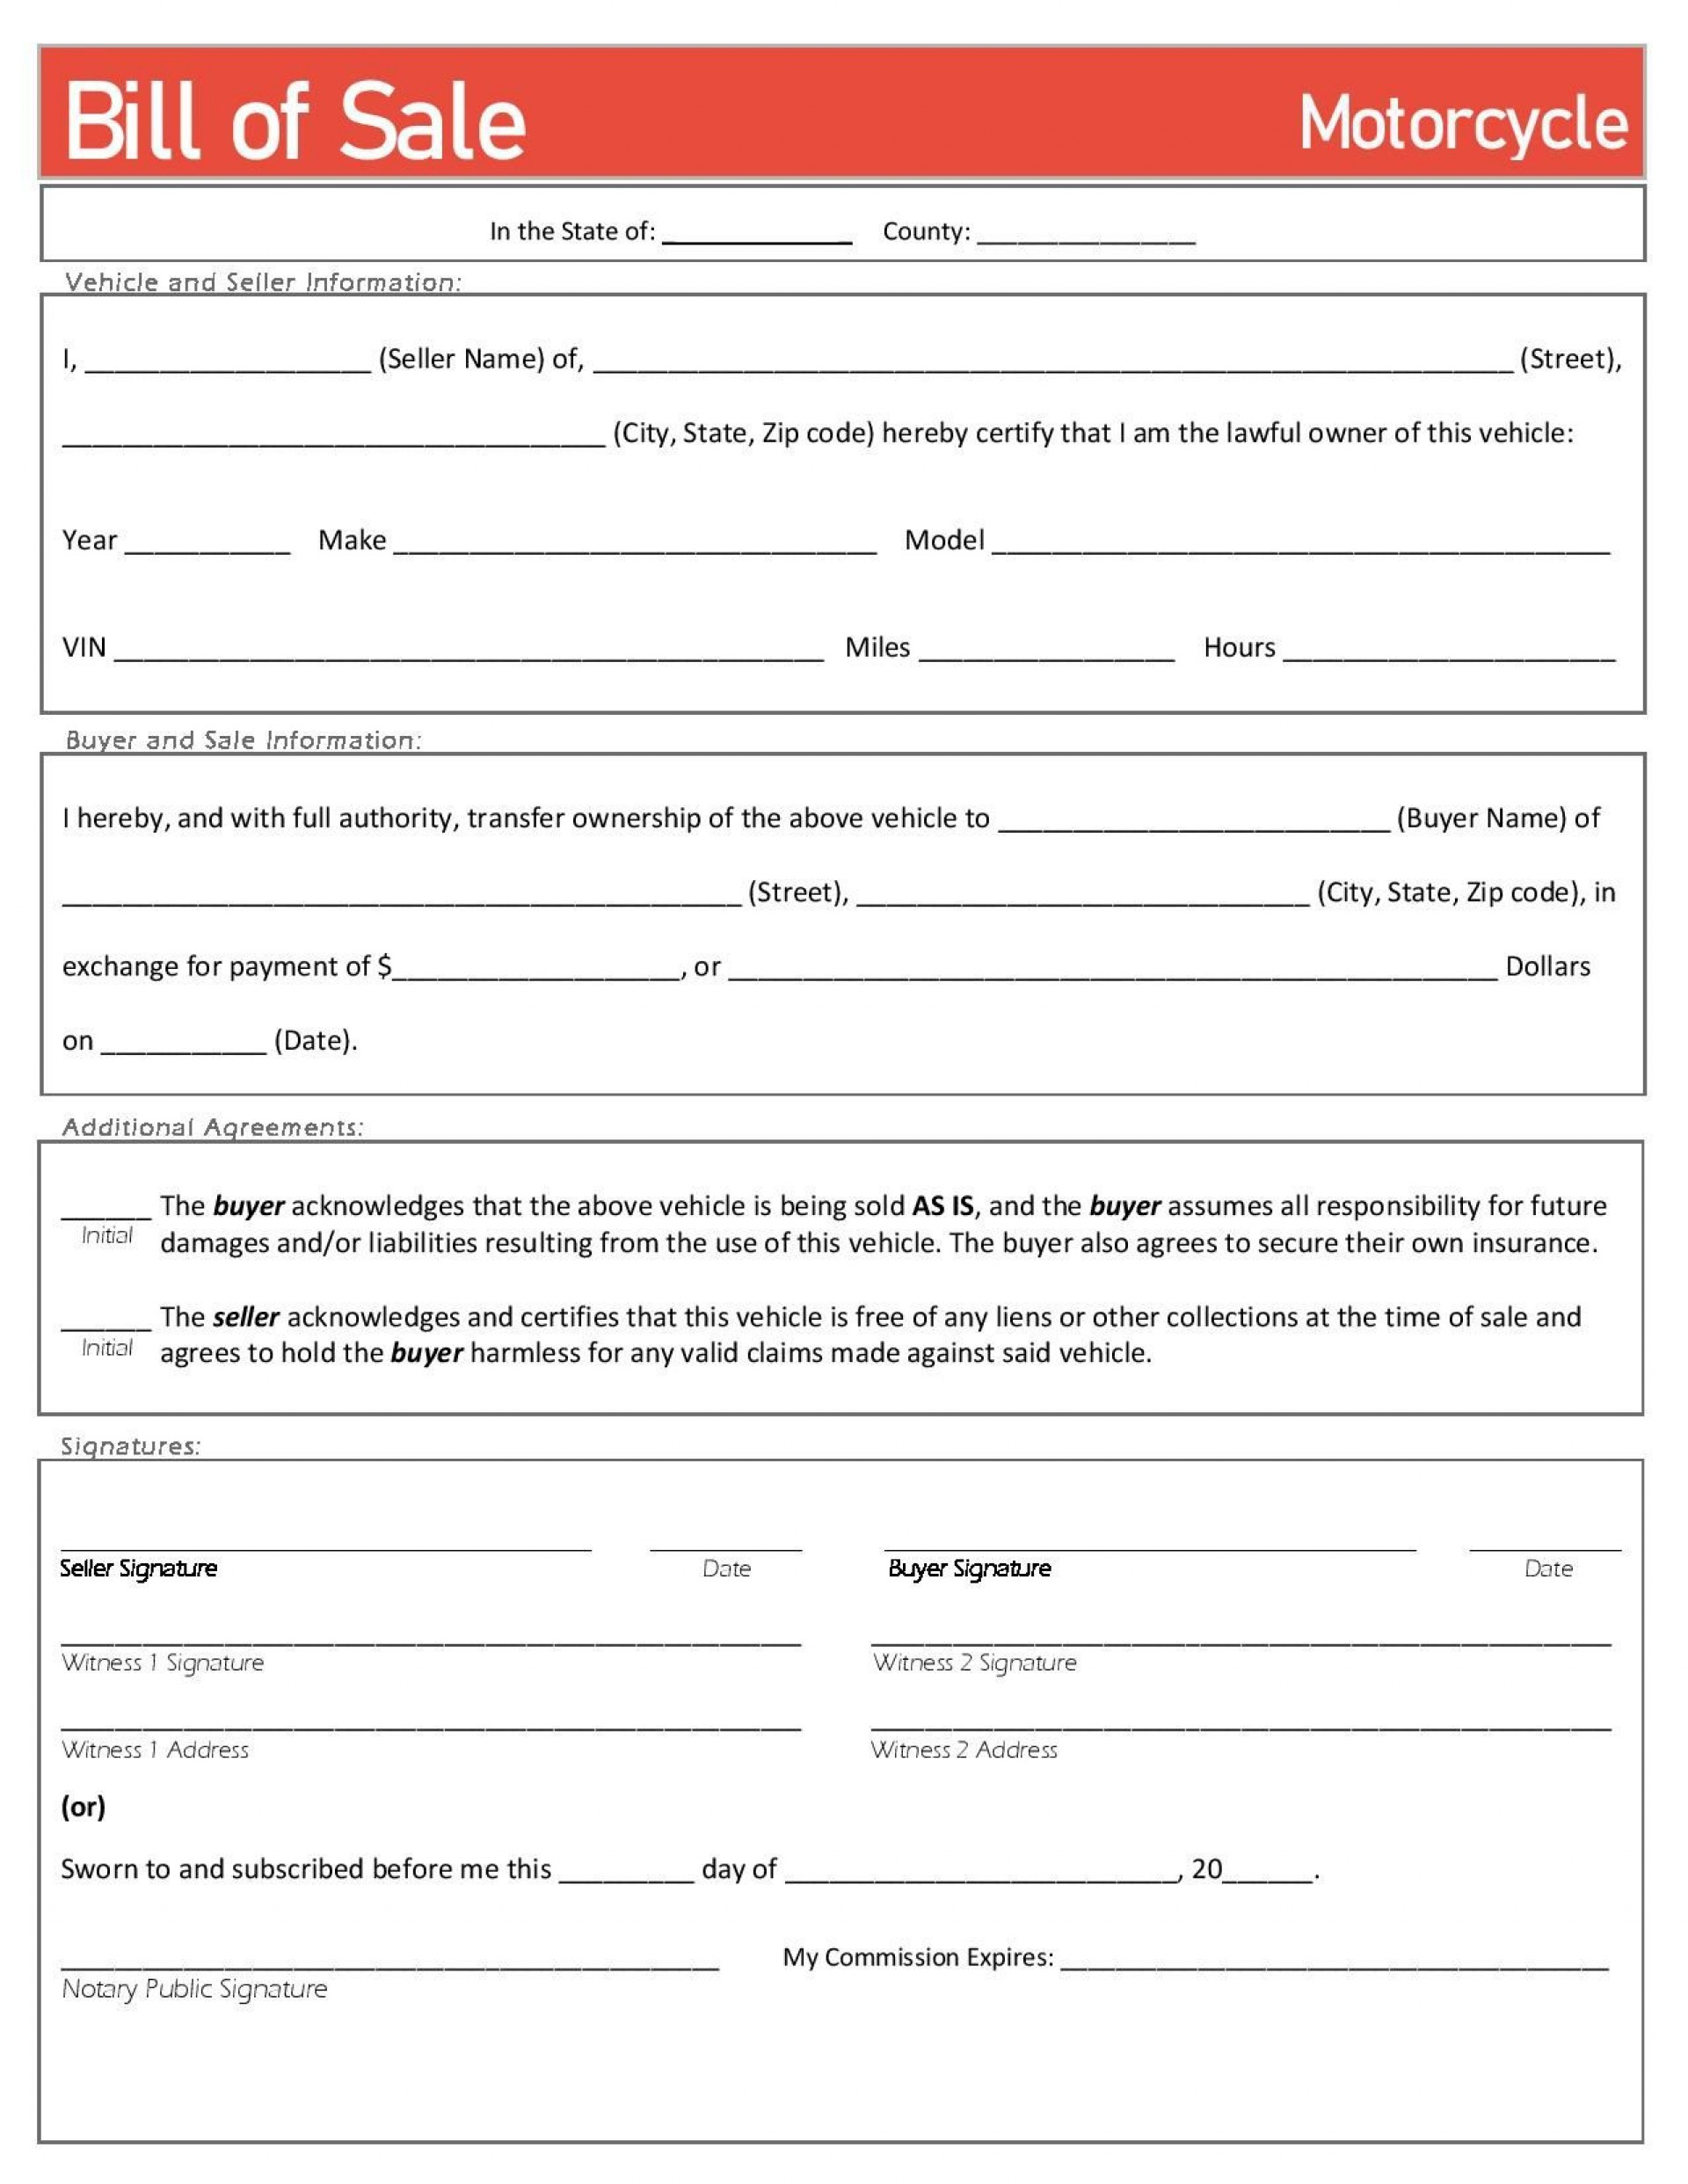 002 Sensational Bill Of Sale Template Texa Highest Quality  Texas Free Car Form Dmv Document1920